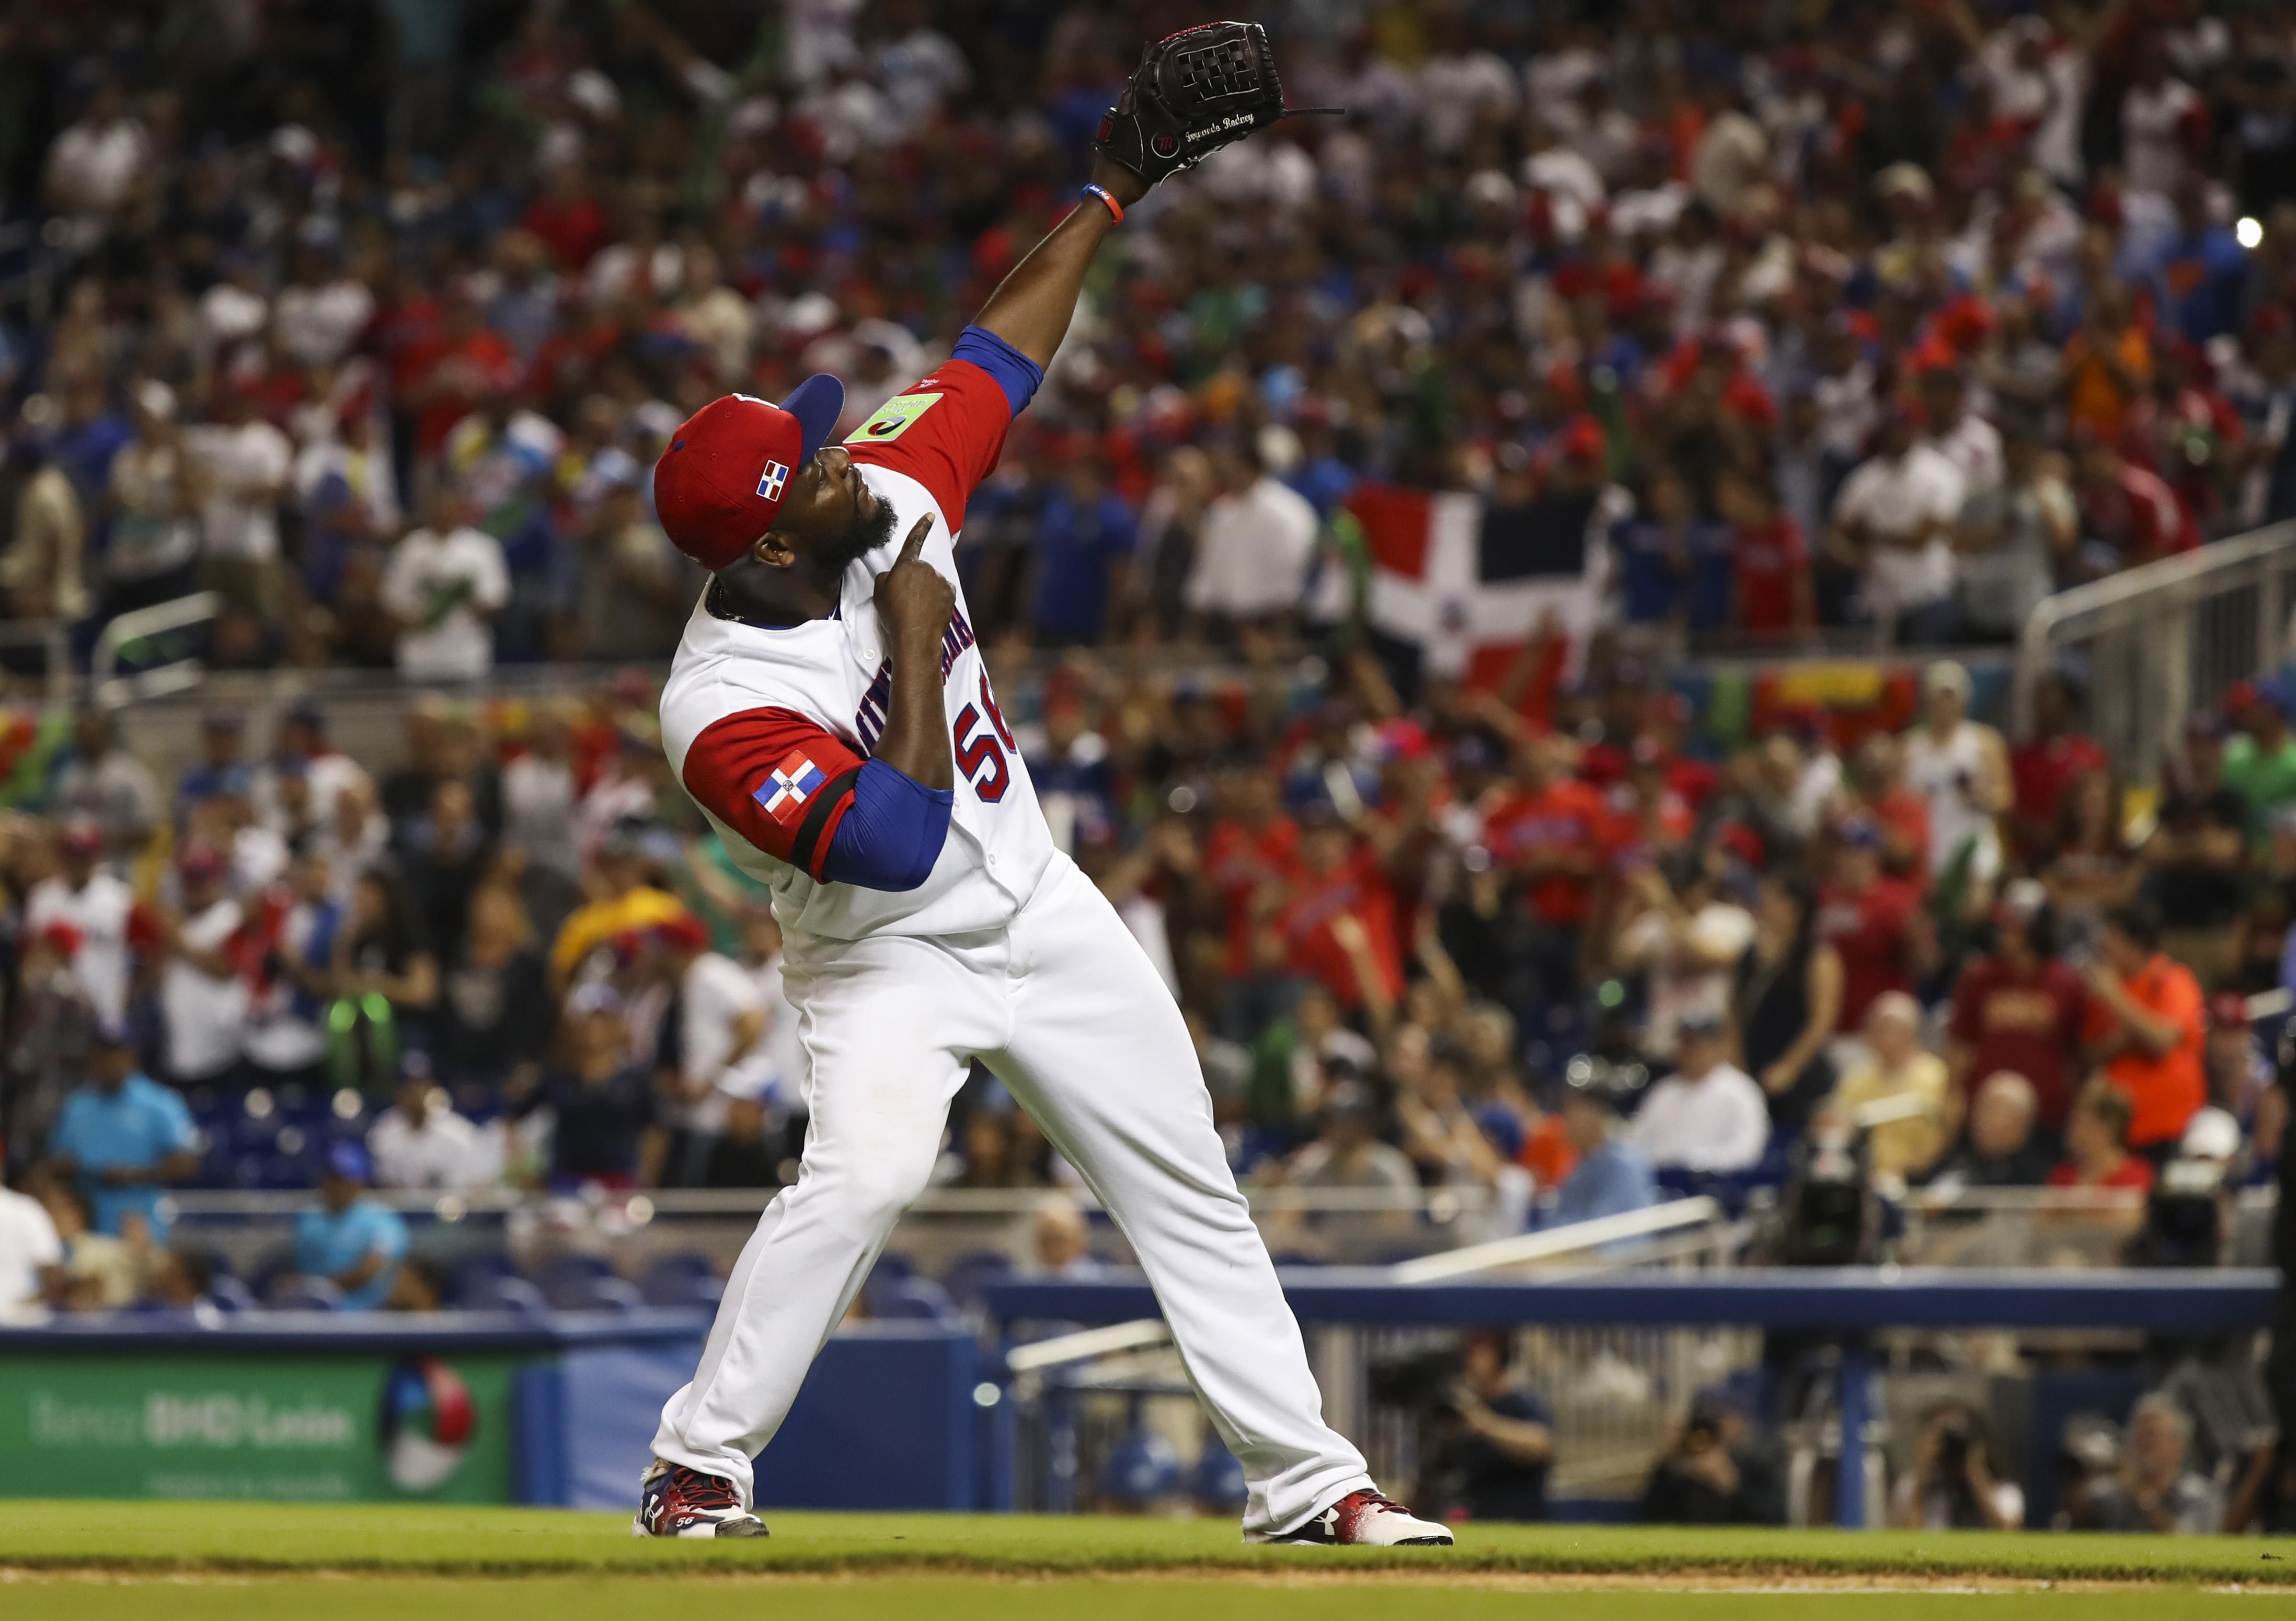 9928793-baseball-world-baseball-classic-canada-at-dominican-republic